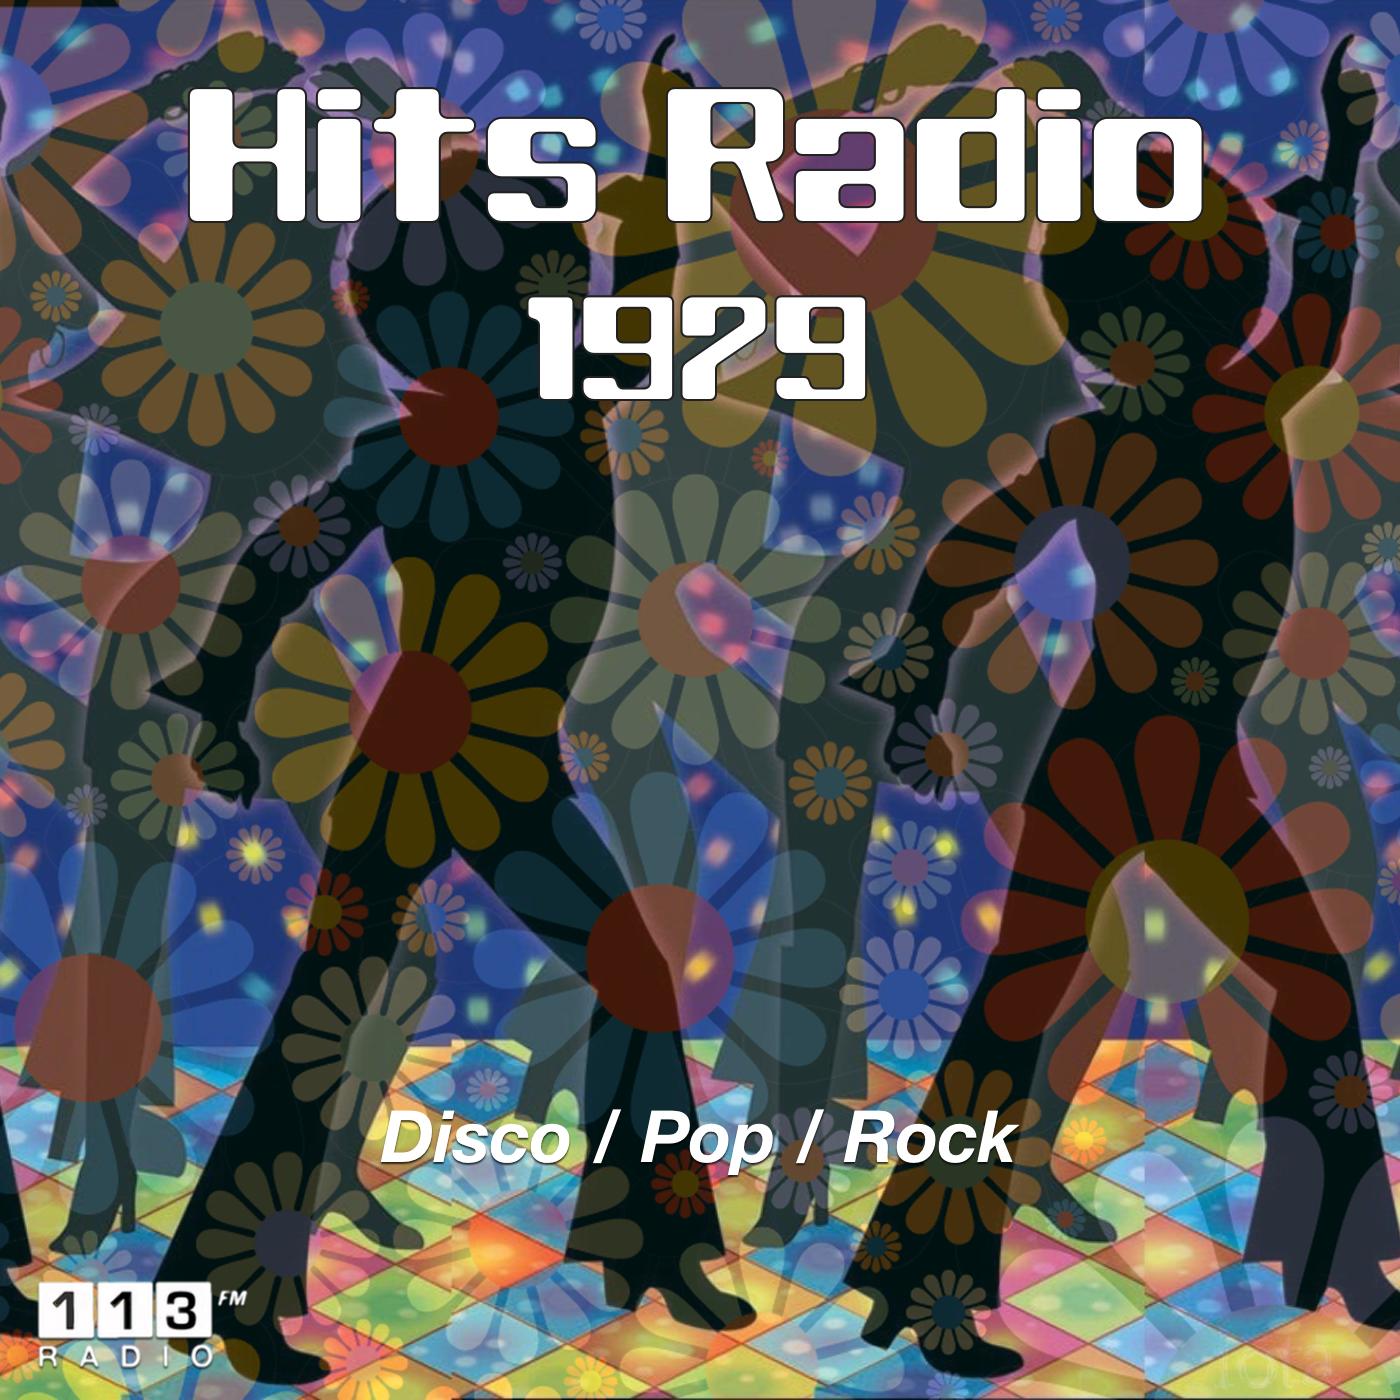 113.fm Hits Radio - 1979